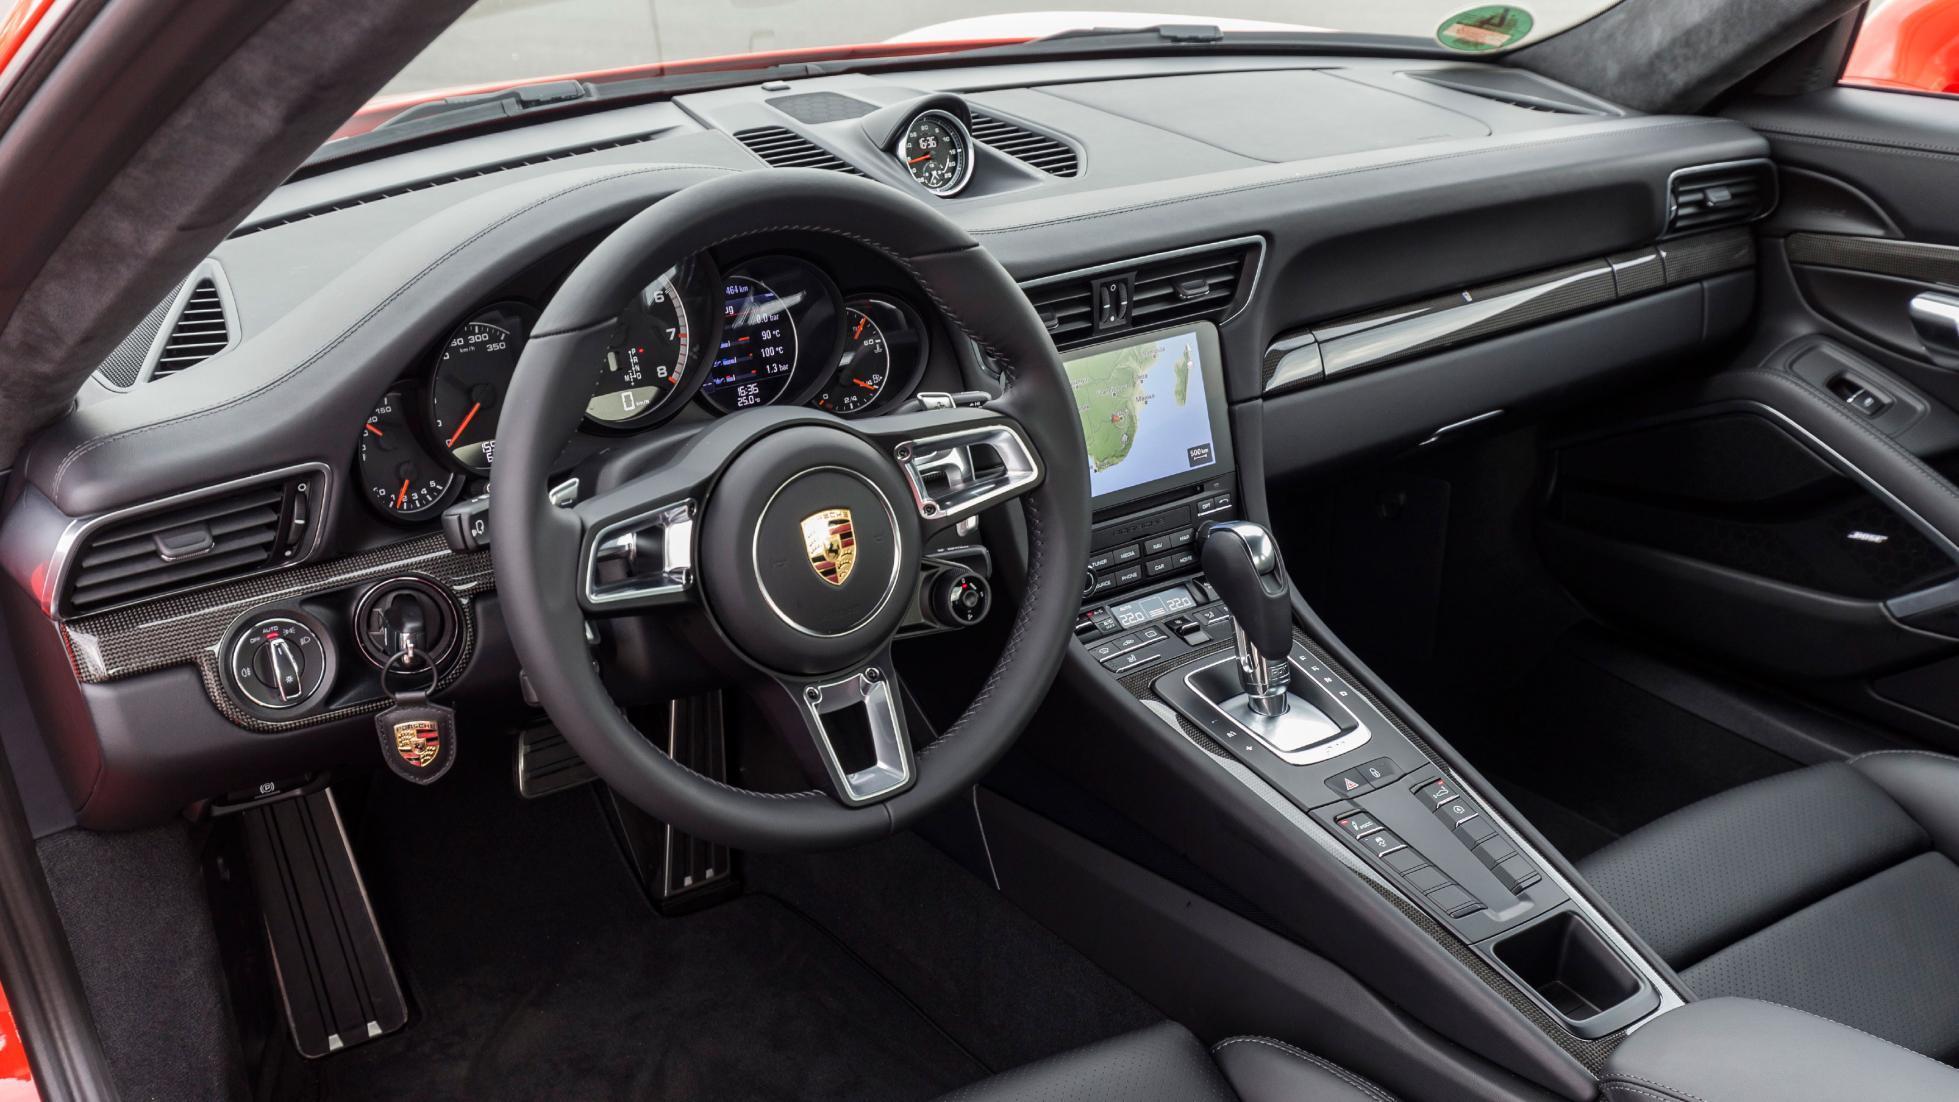 Interieur Porsche 911 Turbo 991 2013